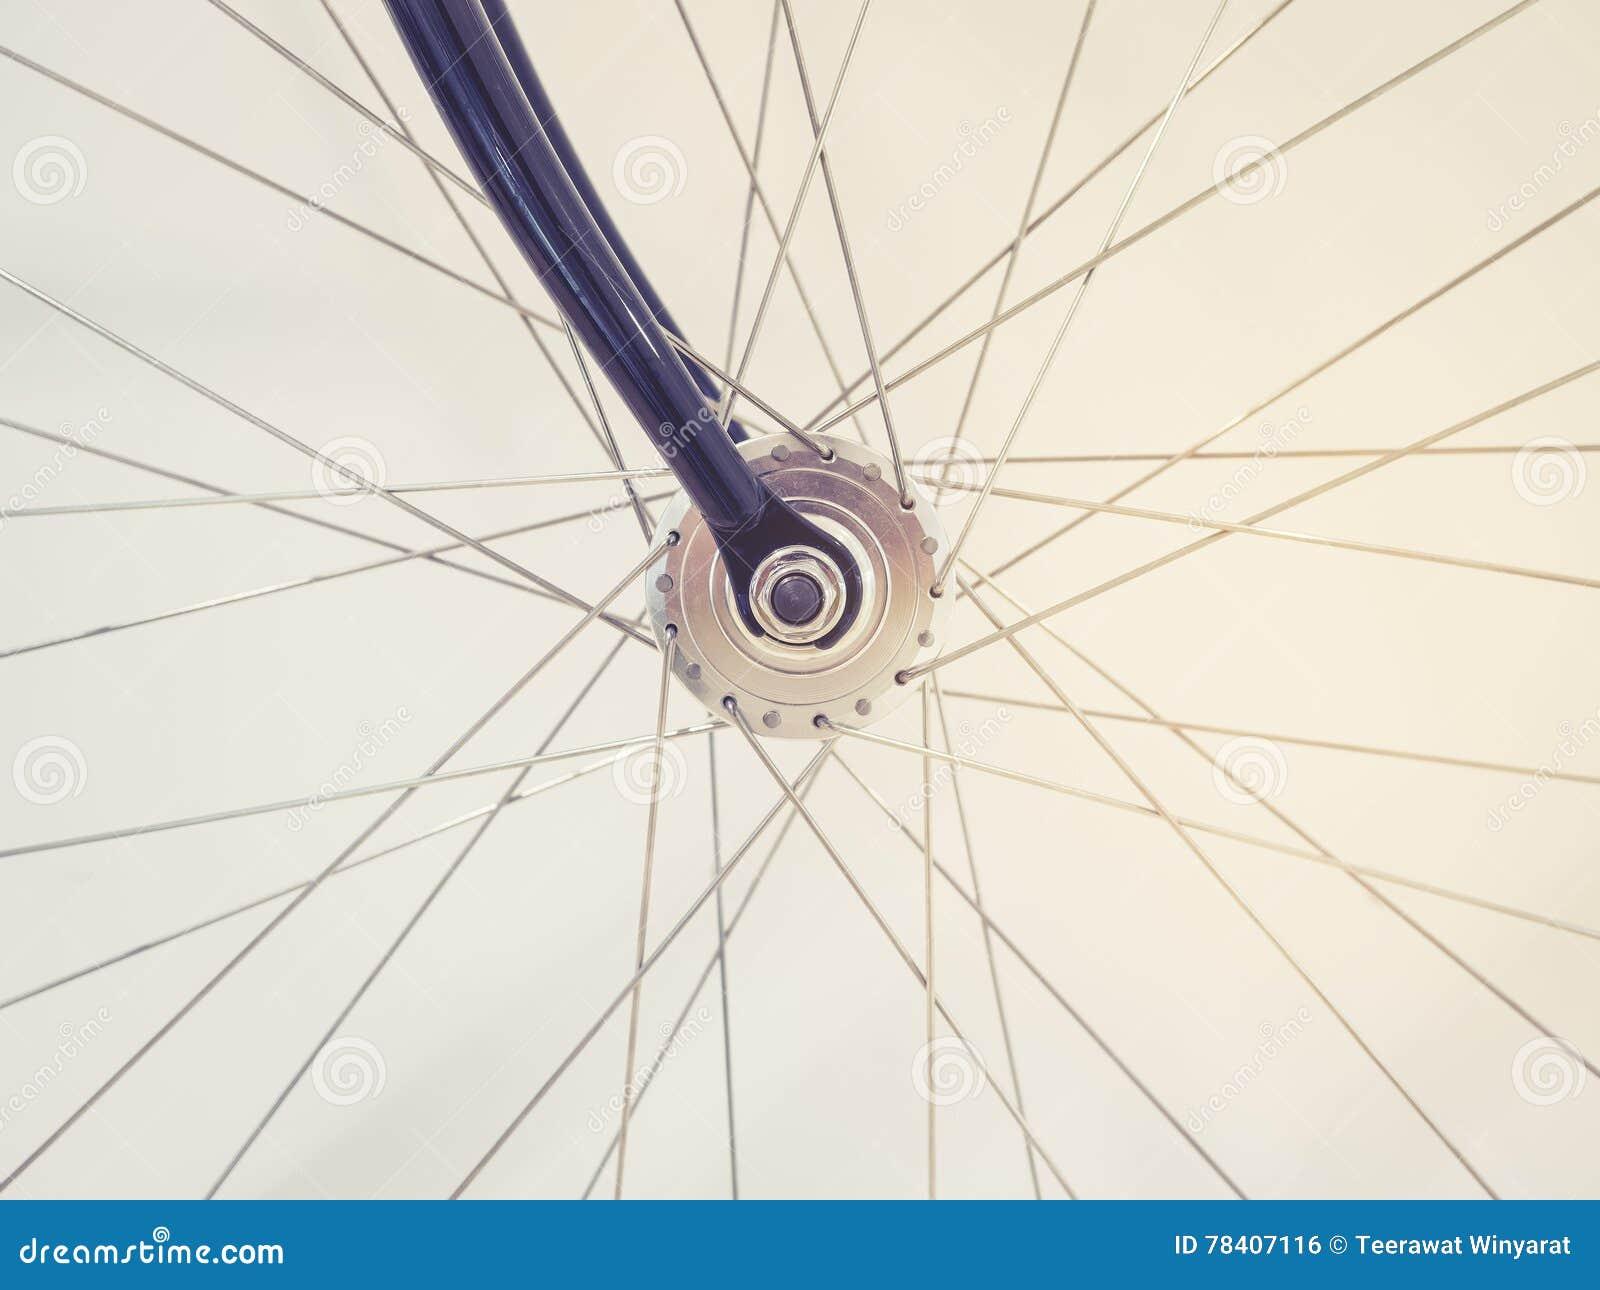 Licht In Fietswiel : Het fietswiel spraken en de kettingsdetails stock foto